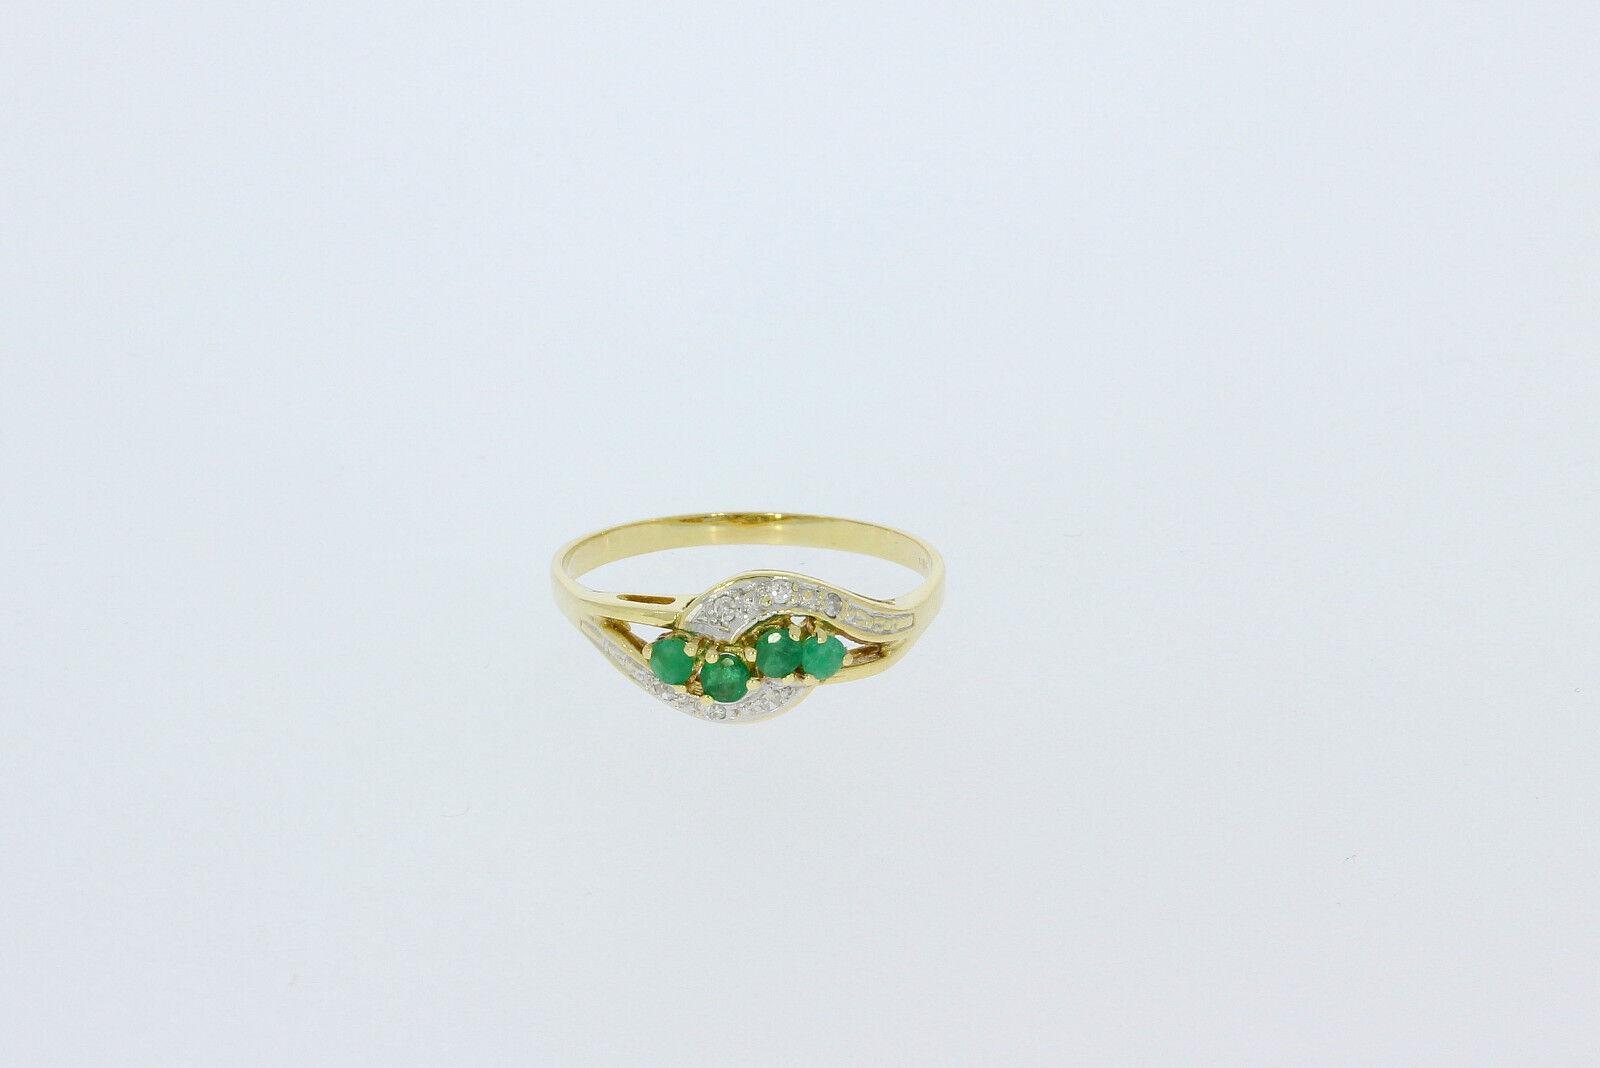 6250-585er yellowgoldring mit Zirkonia+Smaragd Ringgroße 61,5 Kopfbreite 8,4 mm